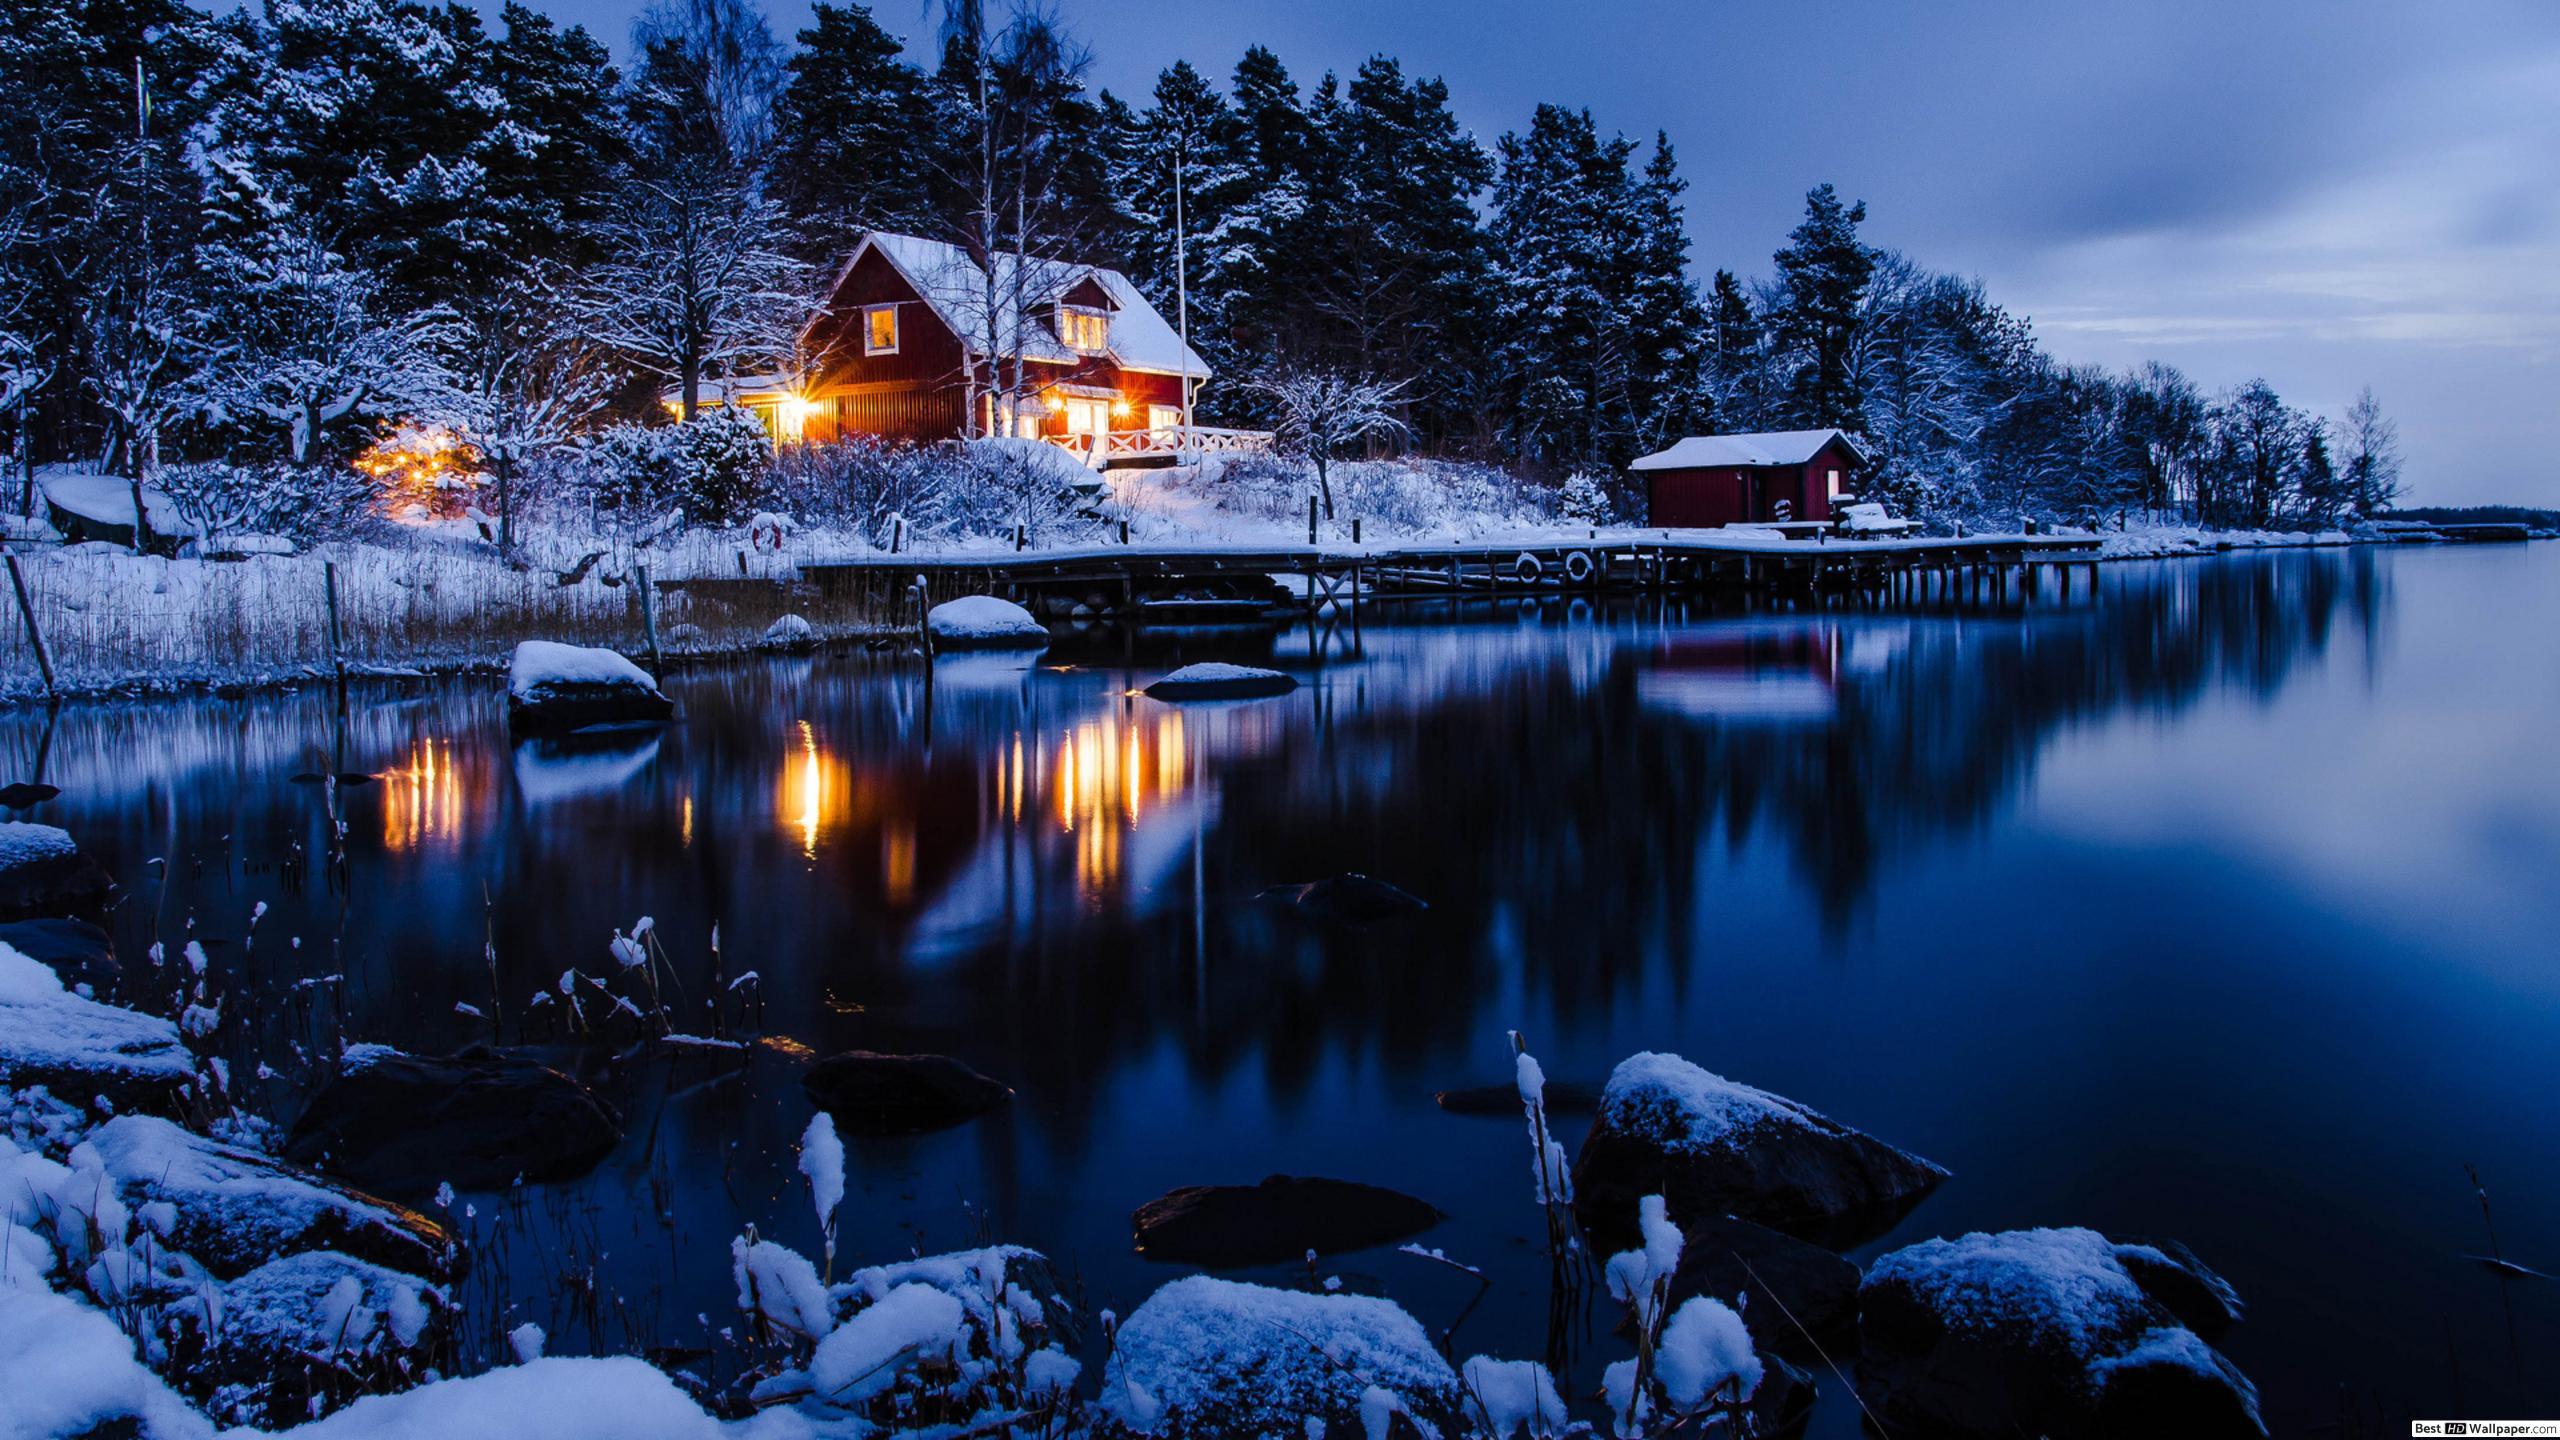 Snowy Cabin Desktop Background 2560x1440 Wallpaper Teahub Io